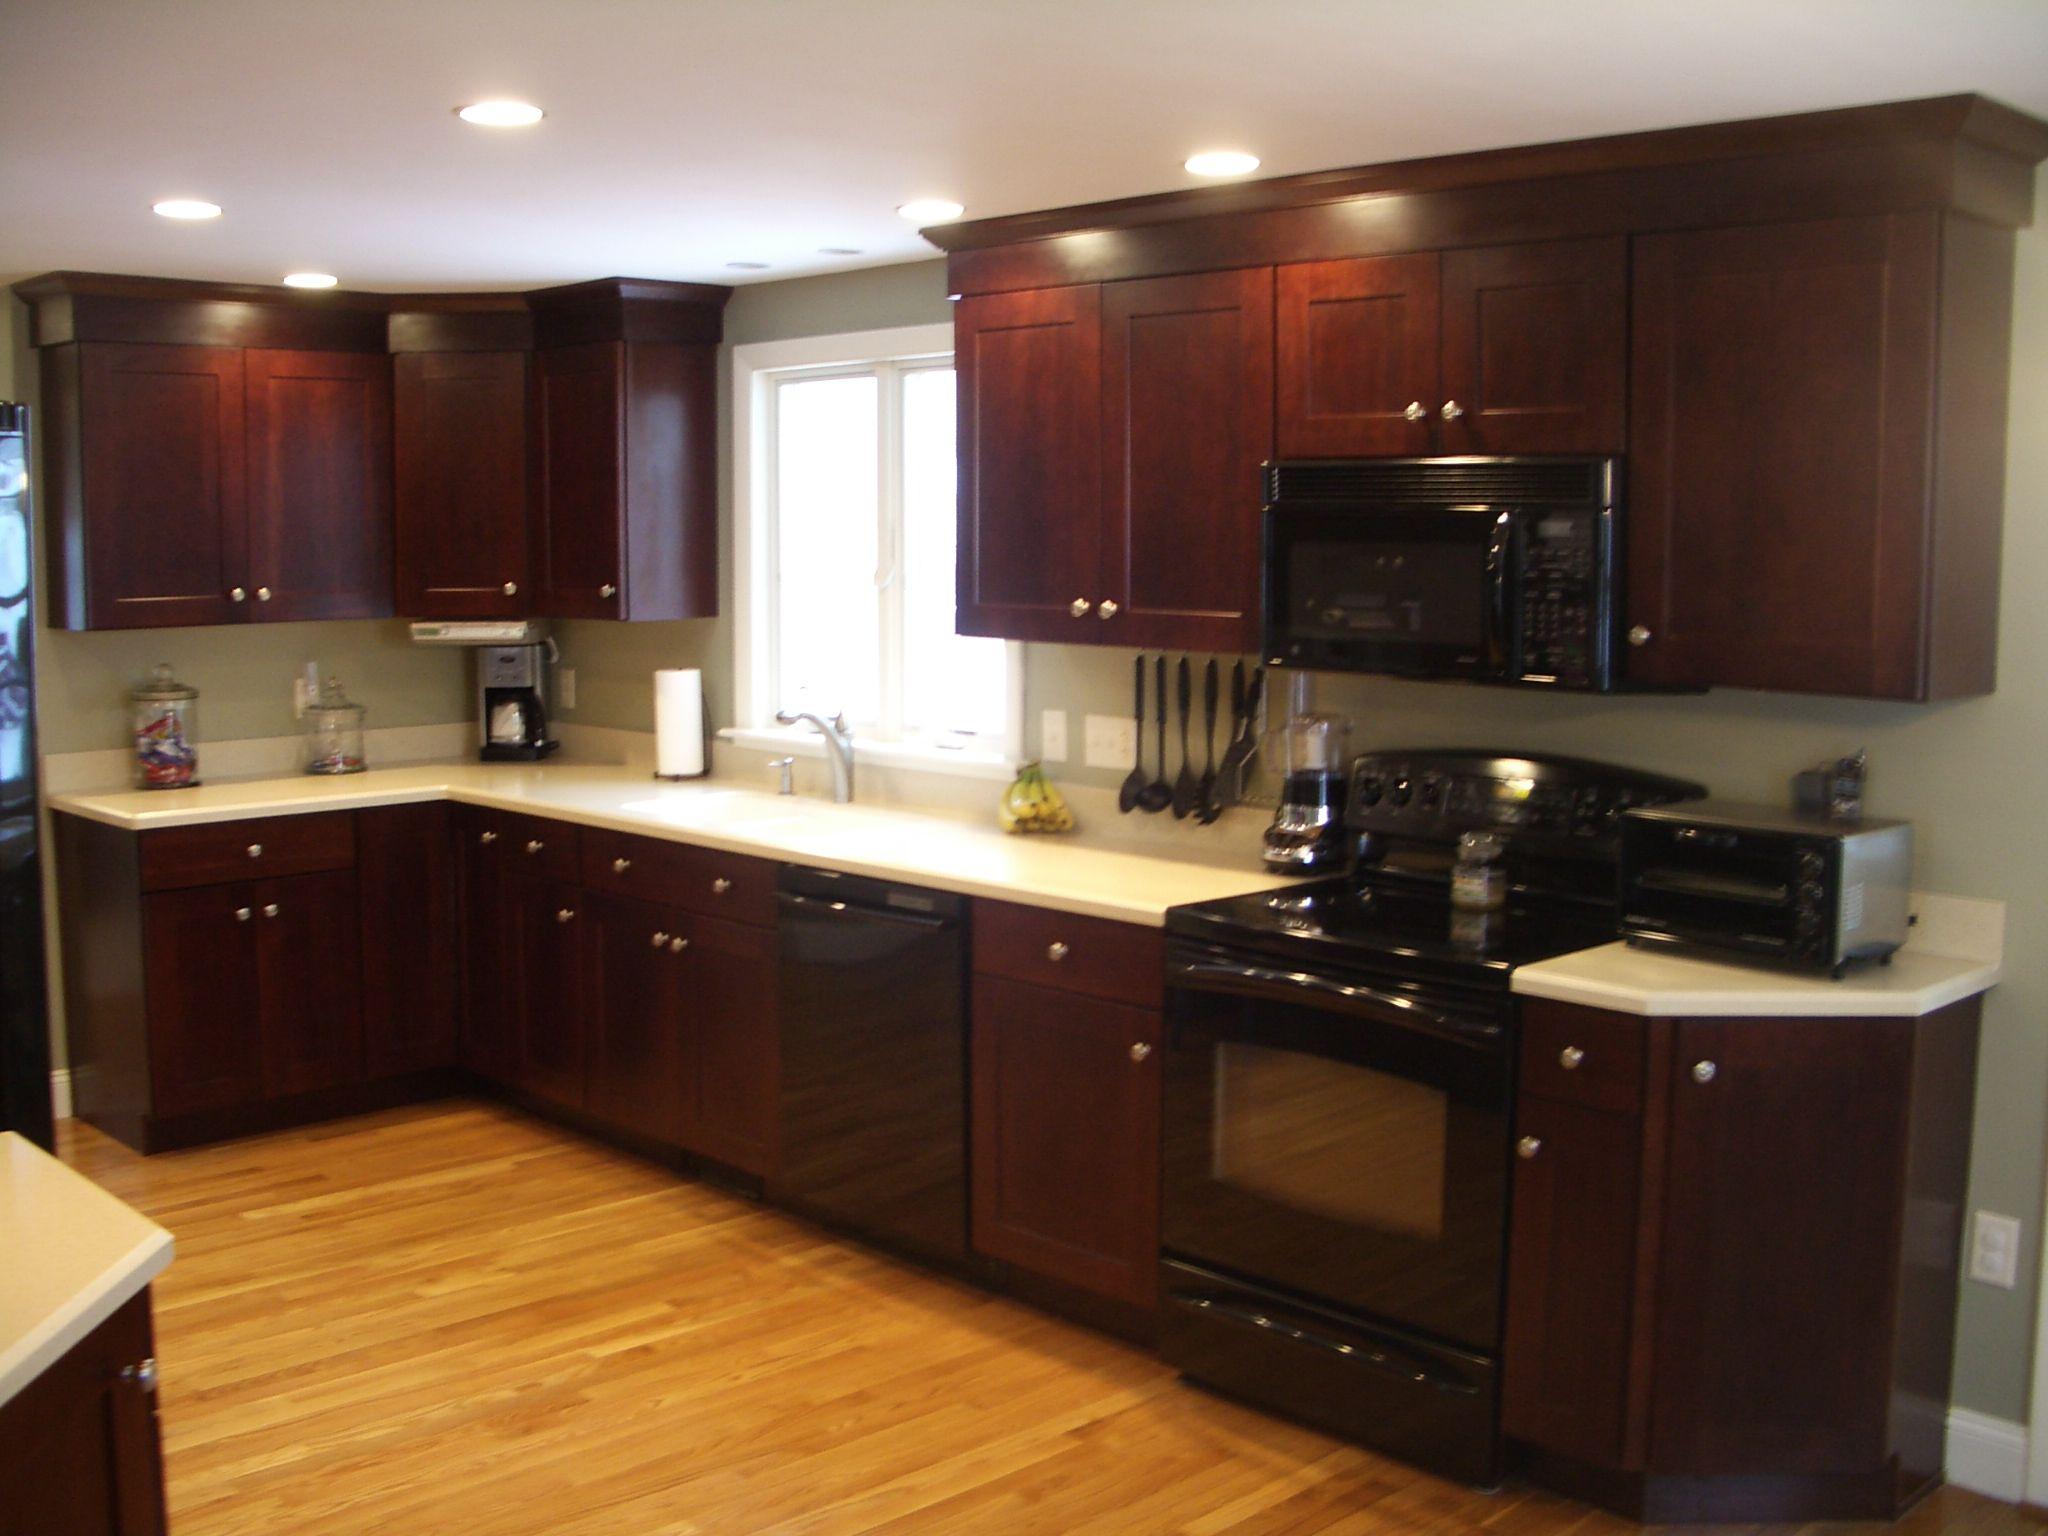 Exceptional Shaker Style Kitchen, Kitchen Cabinet, Corian Countertop, White  Countertops, Black Appliances,